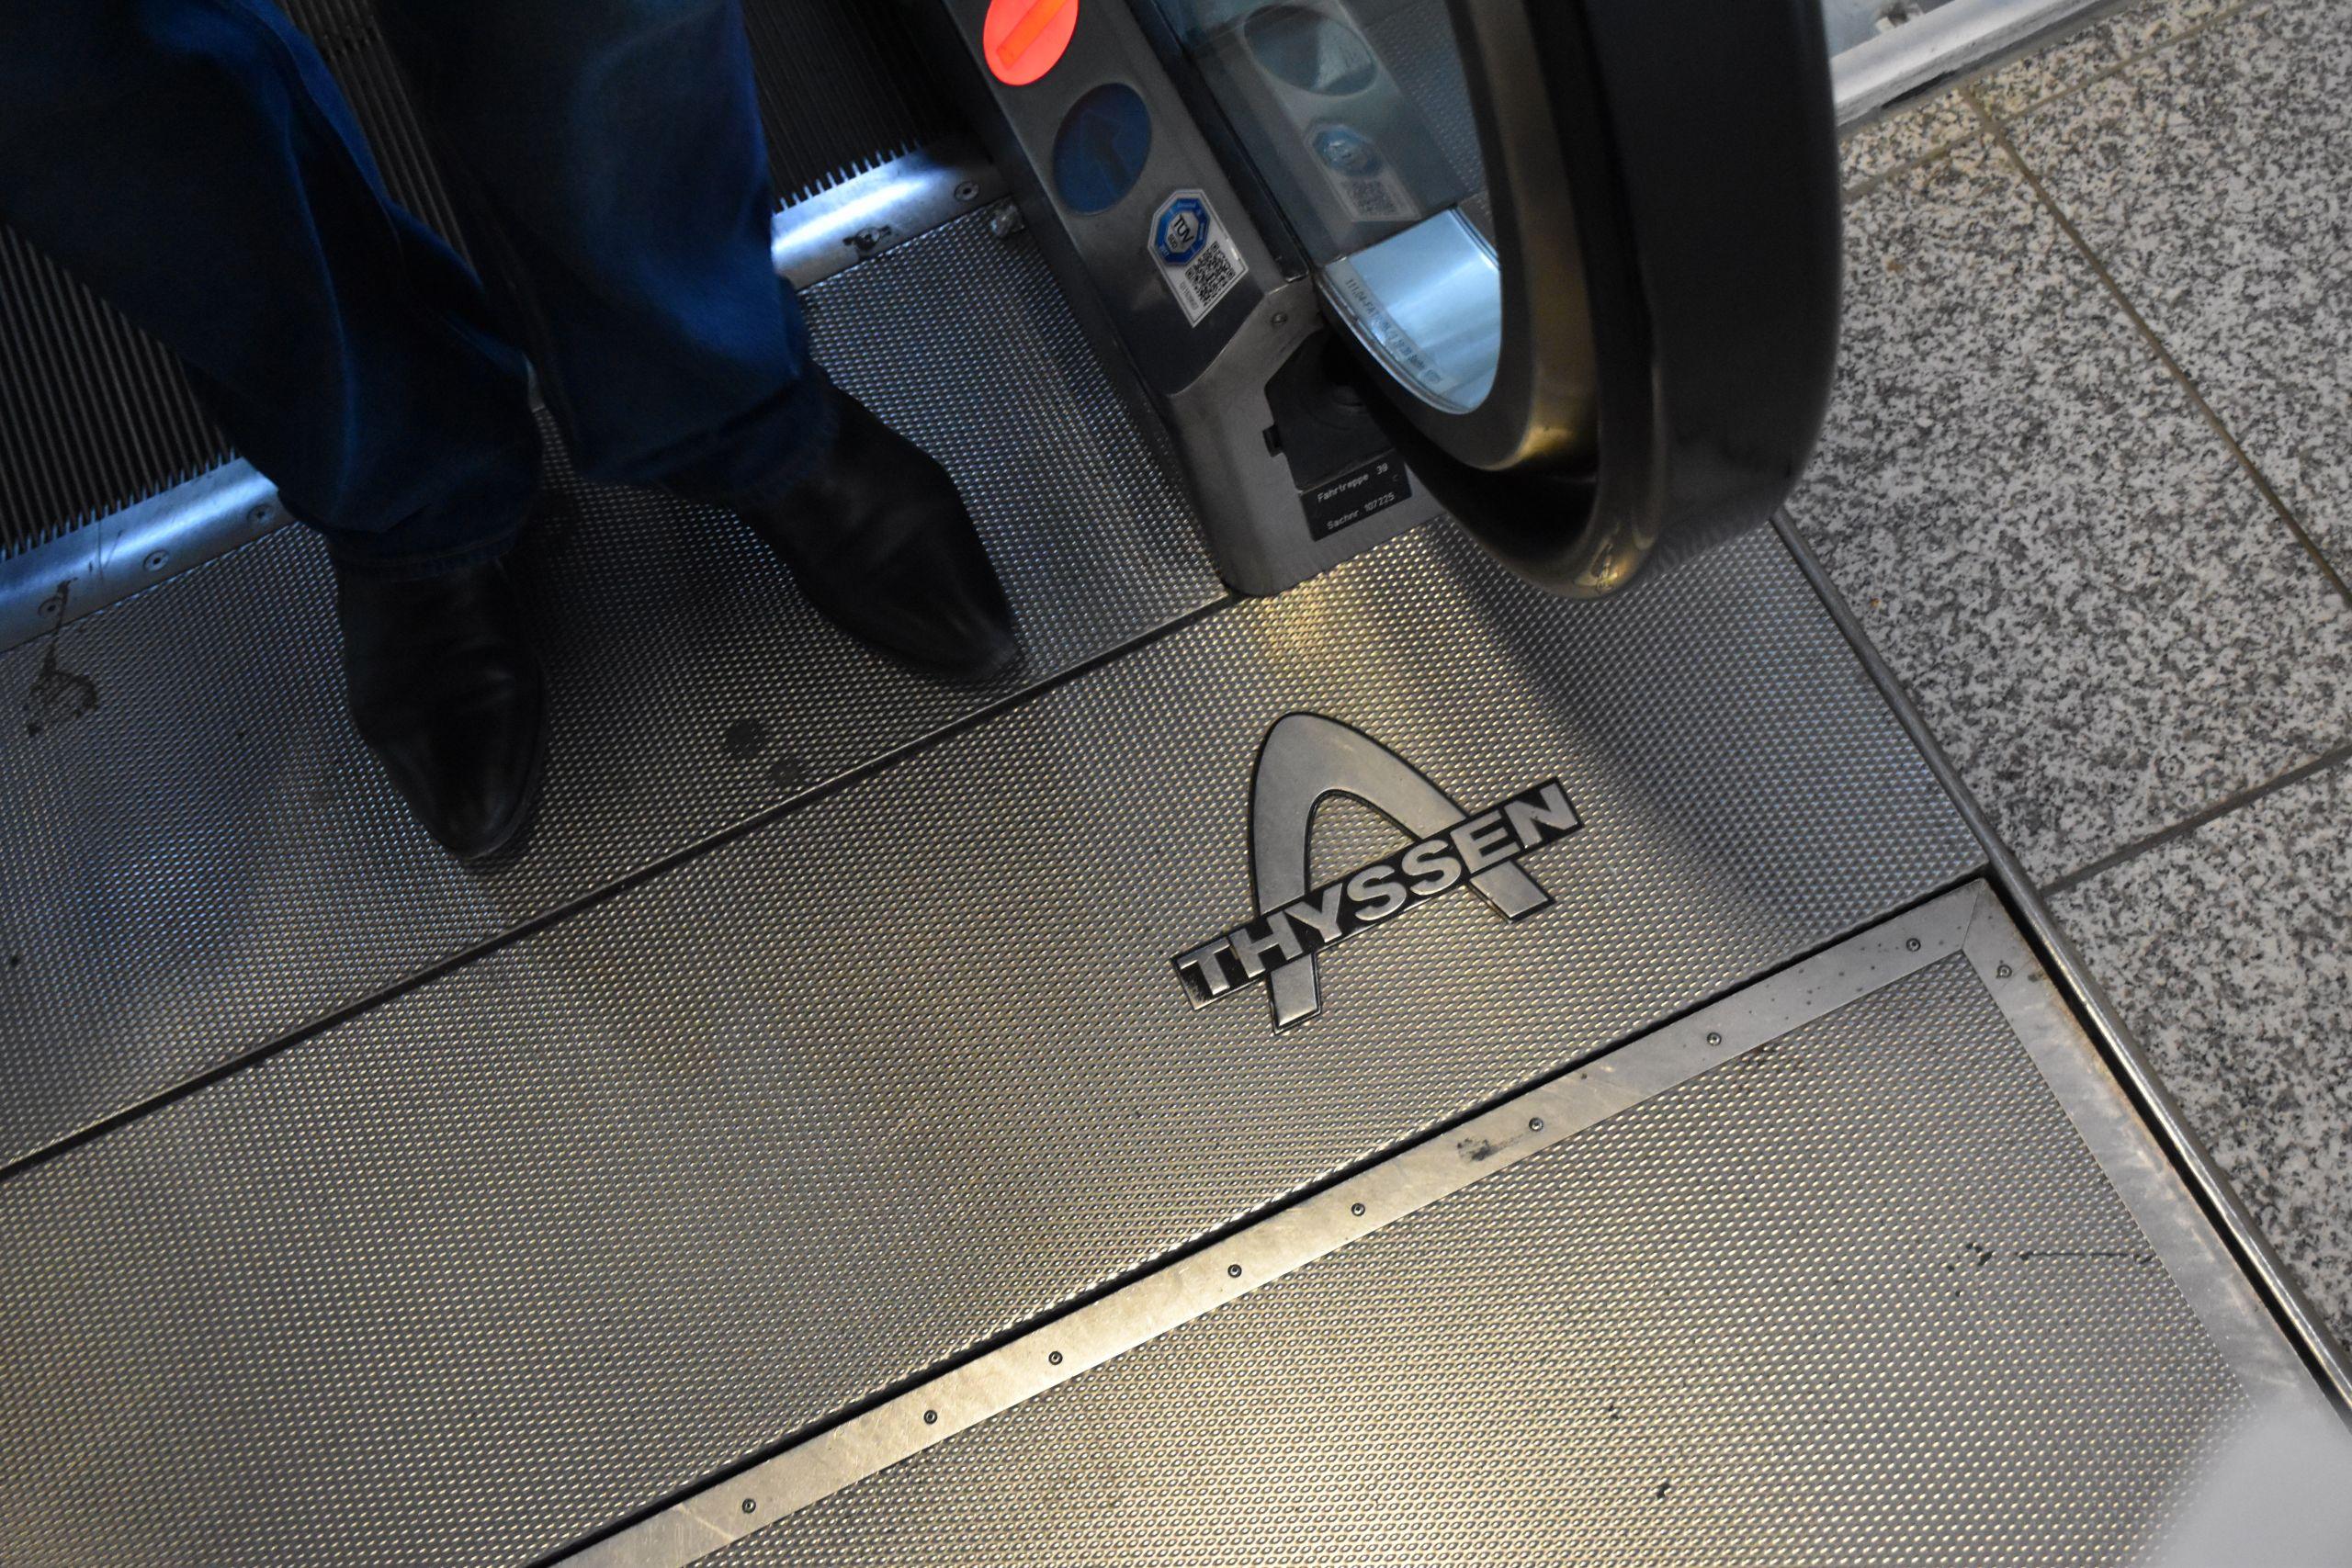 Thyssen logo on its escalator at Munich Airport